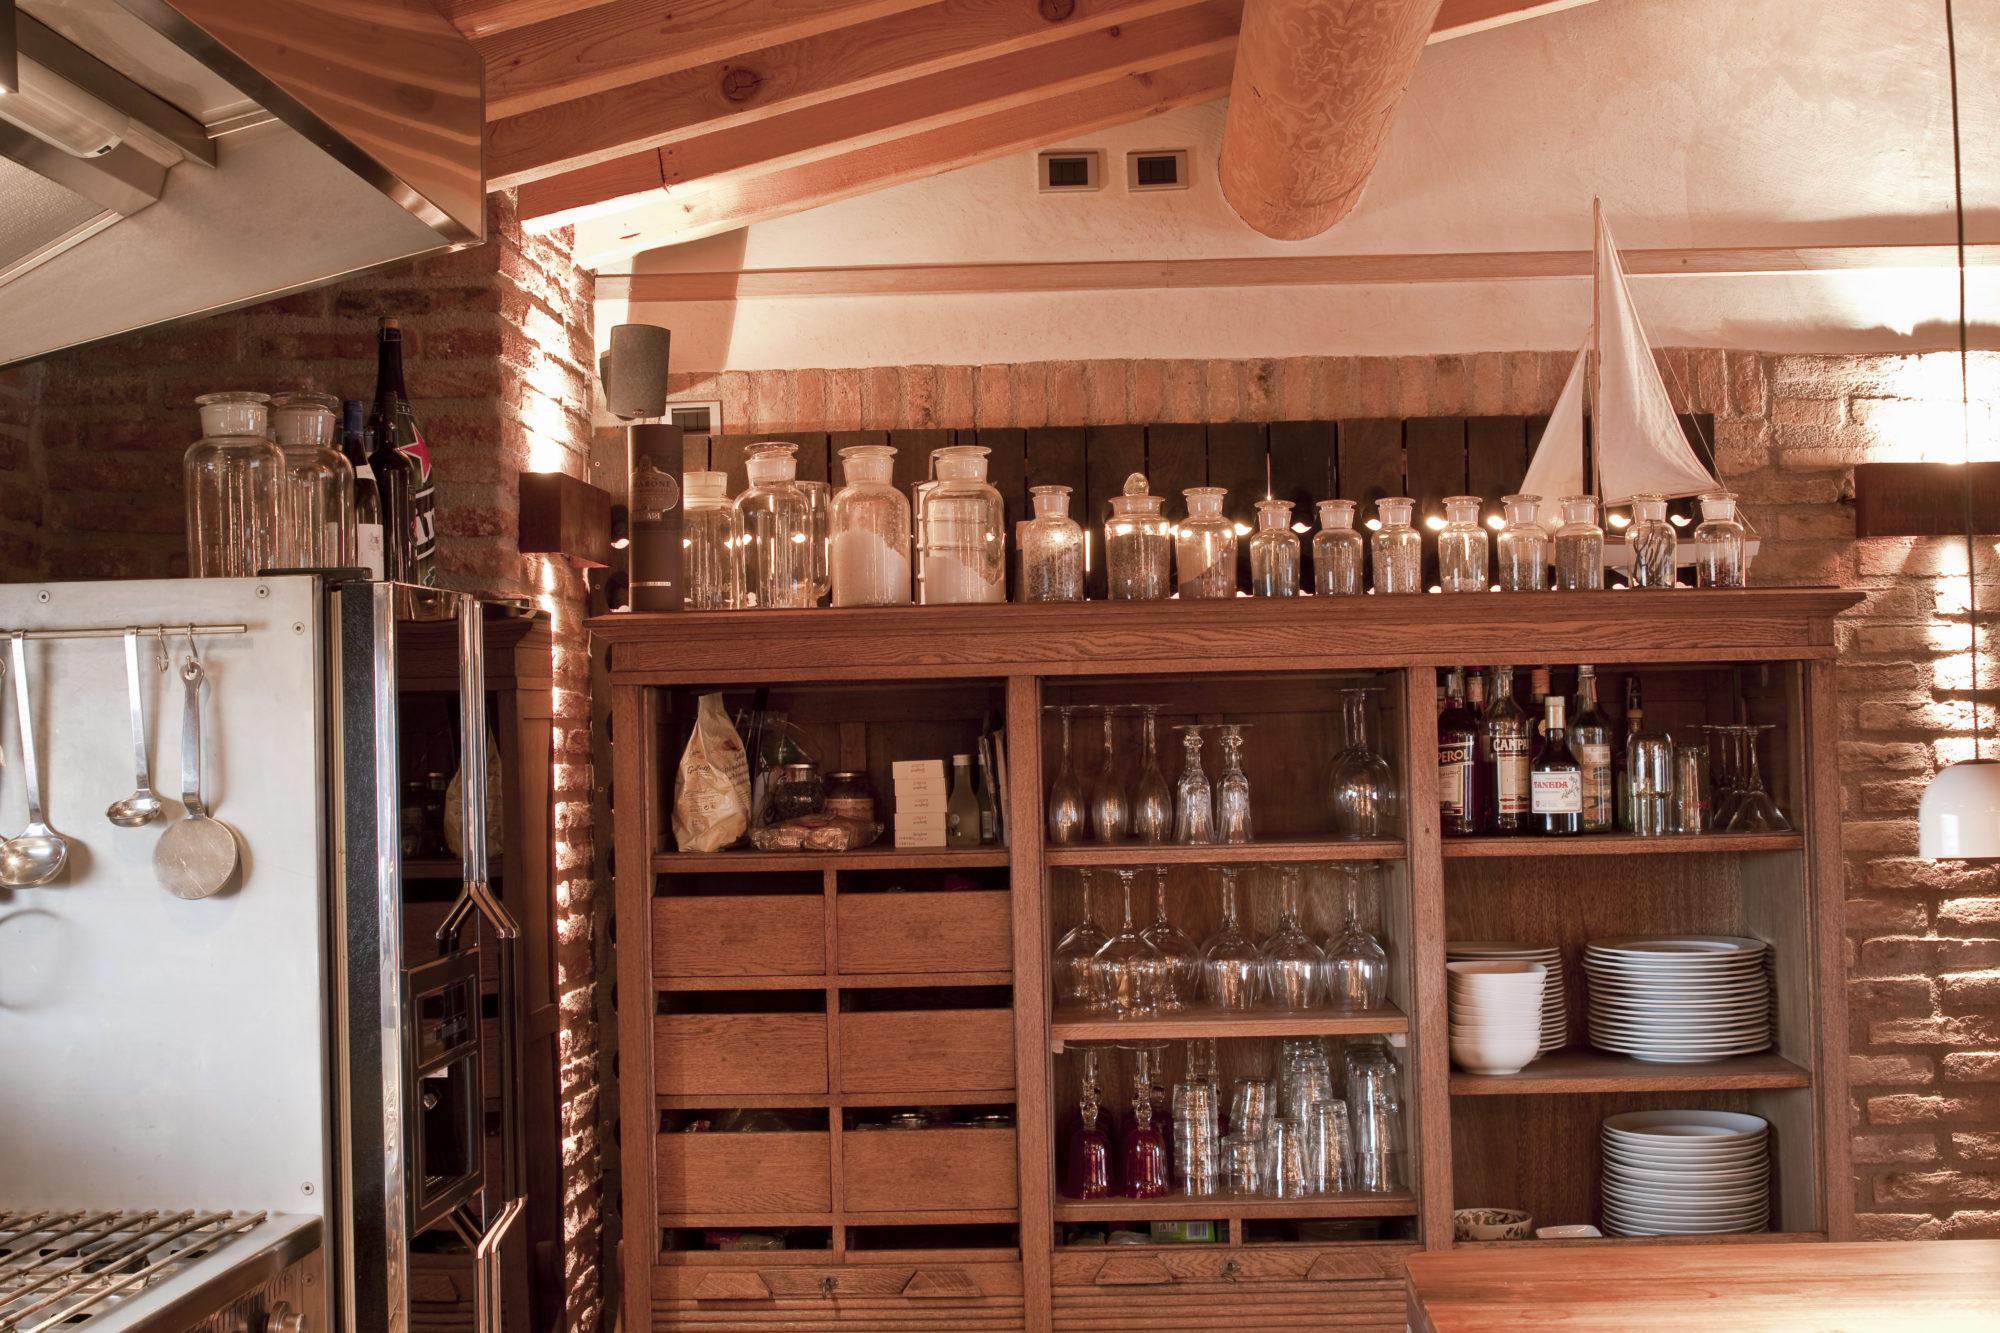 Case di campagna interni fabulous realx foto di casa di for Interno della casa di campagna francese